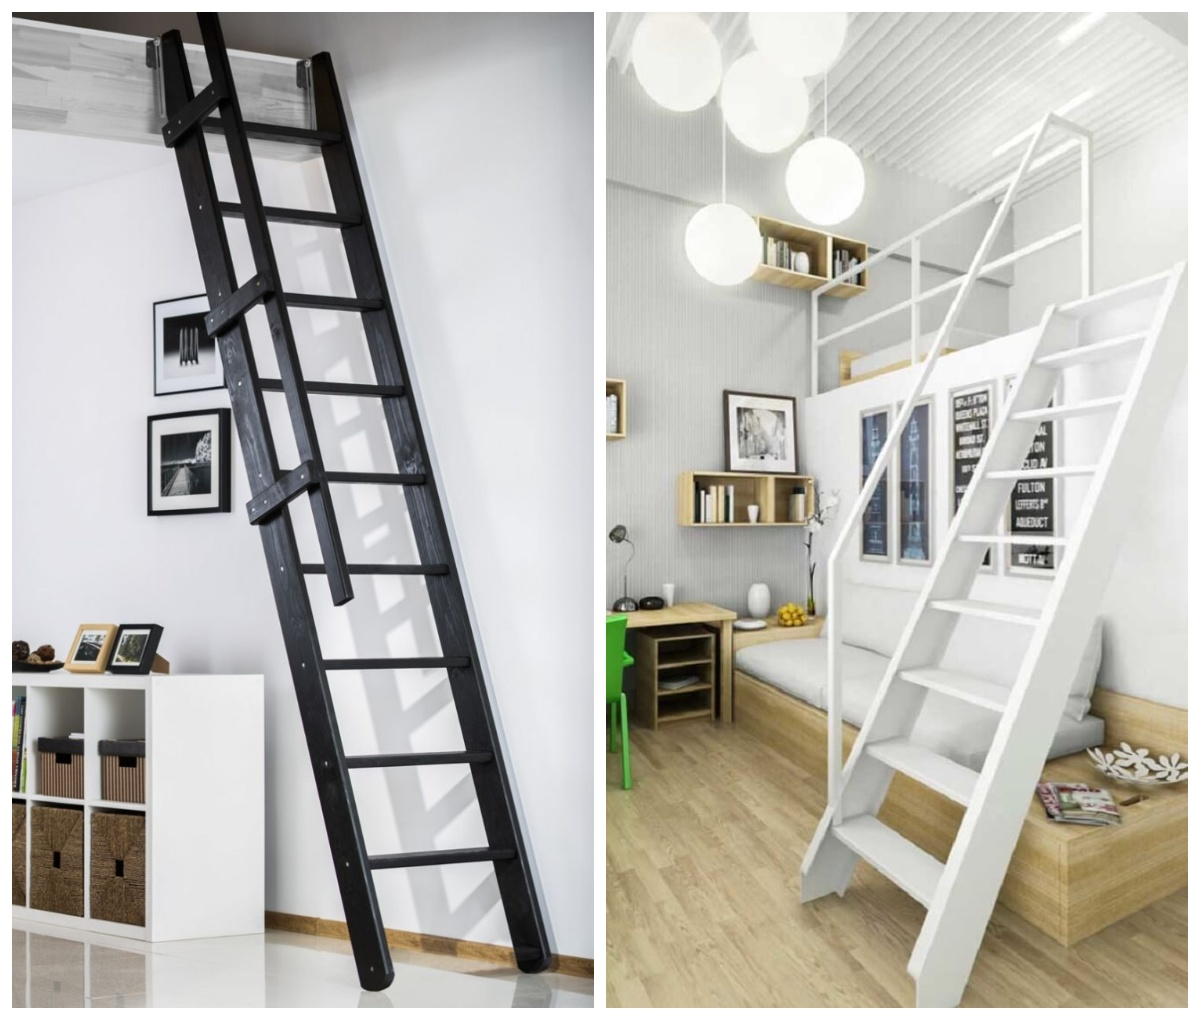 Młynarskie schody na półpiętro